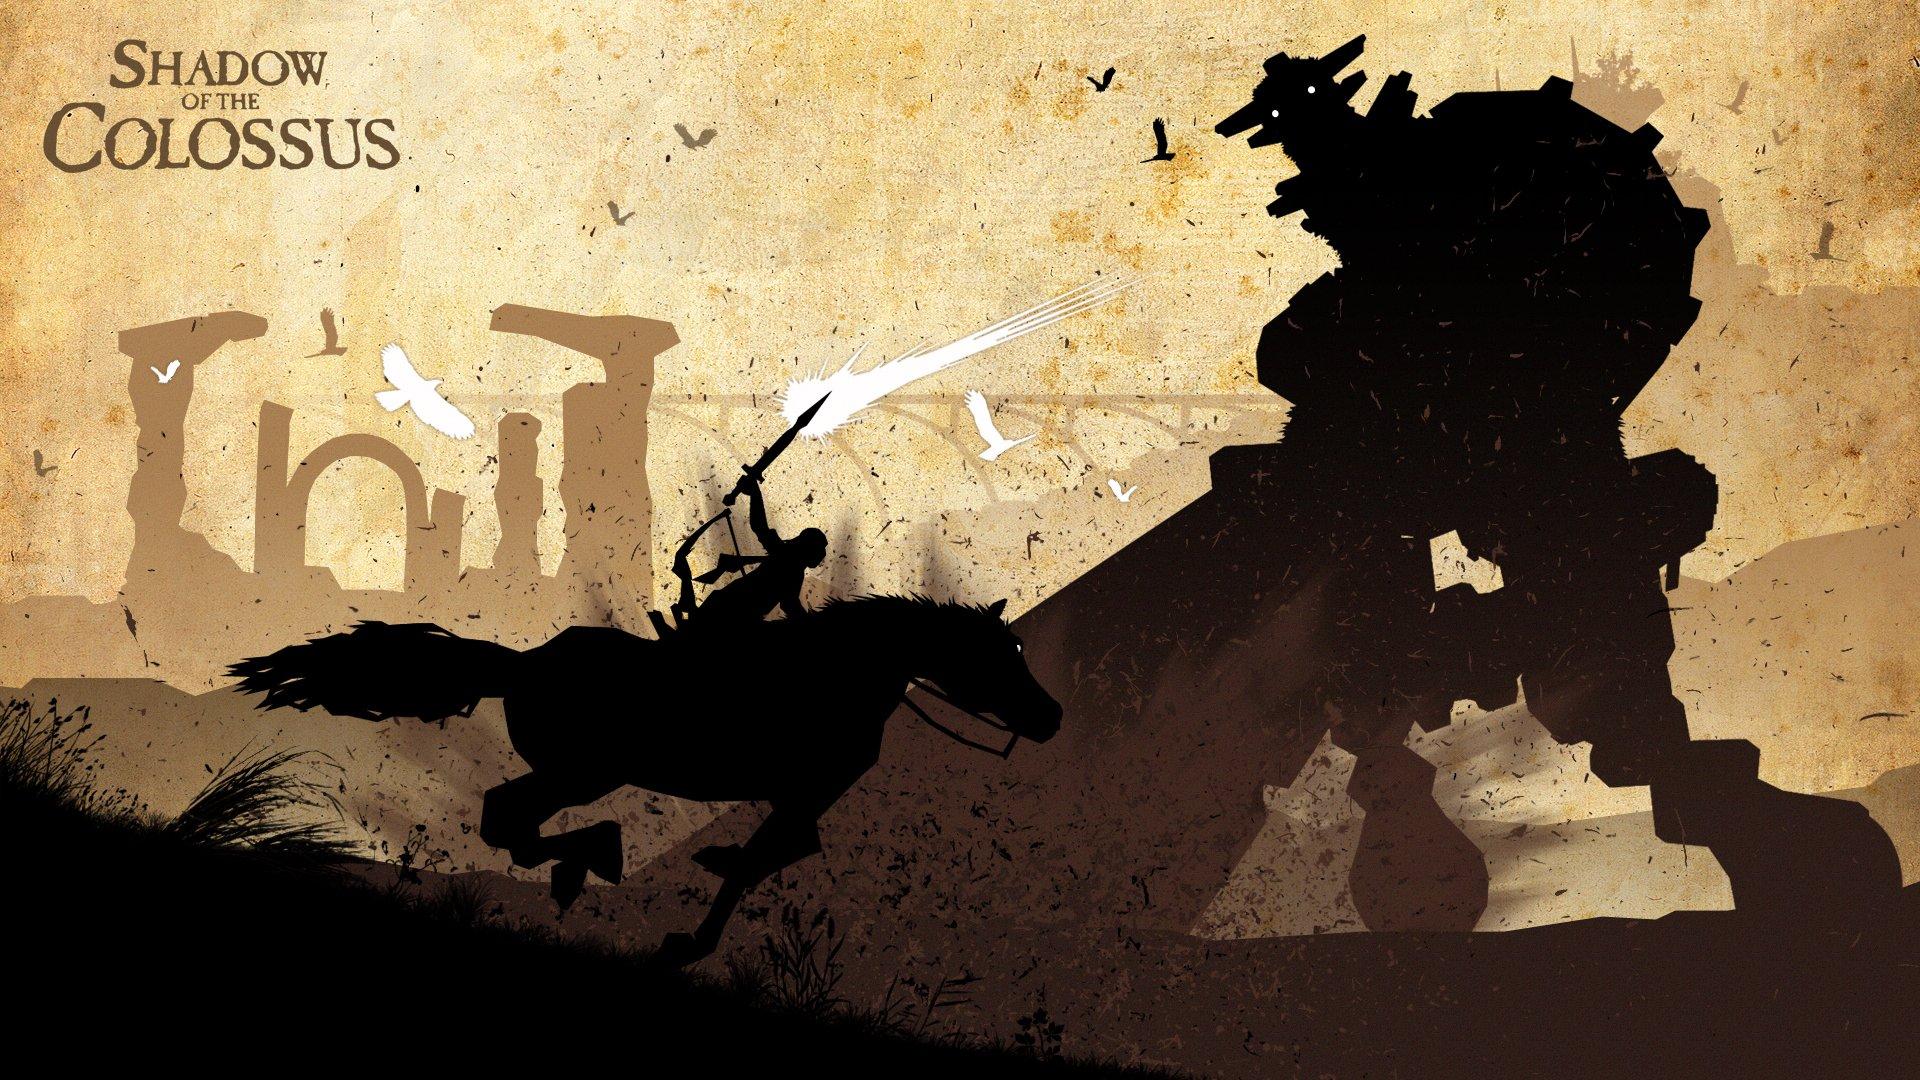 Игра. Легенда. История. Шедевр - Shadow of the Colossus!. - Изображение 1